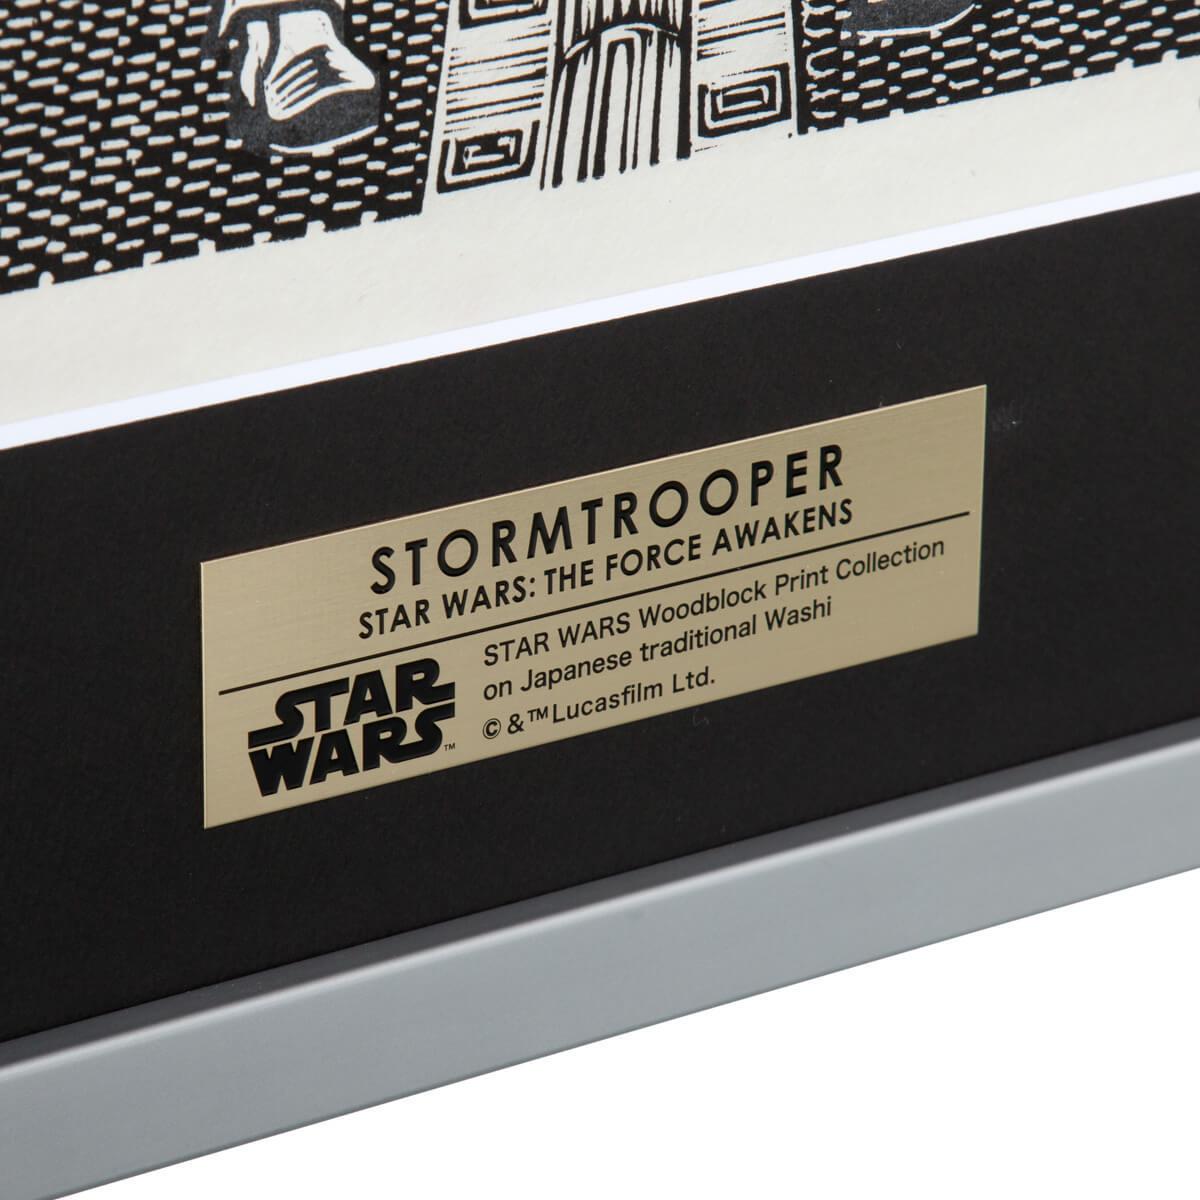 STORMTROOPER™(ストームトルーパー) (C)& TM Lucasfilm Ltd.